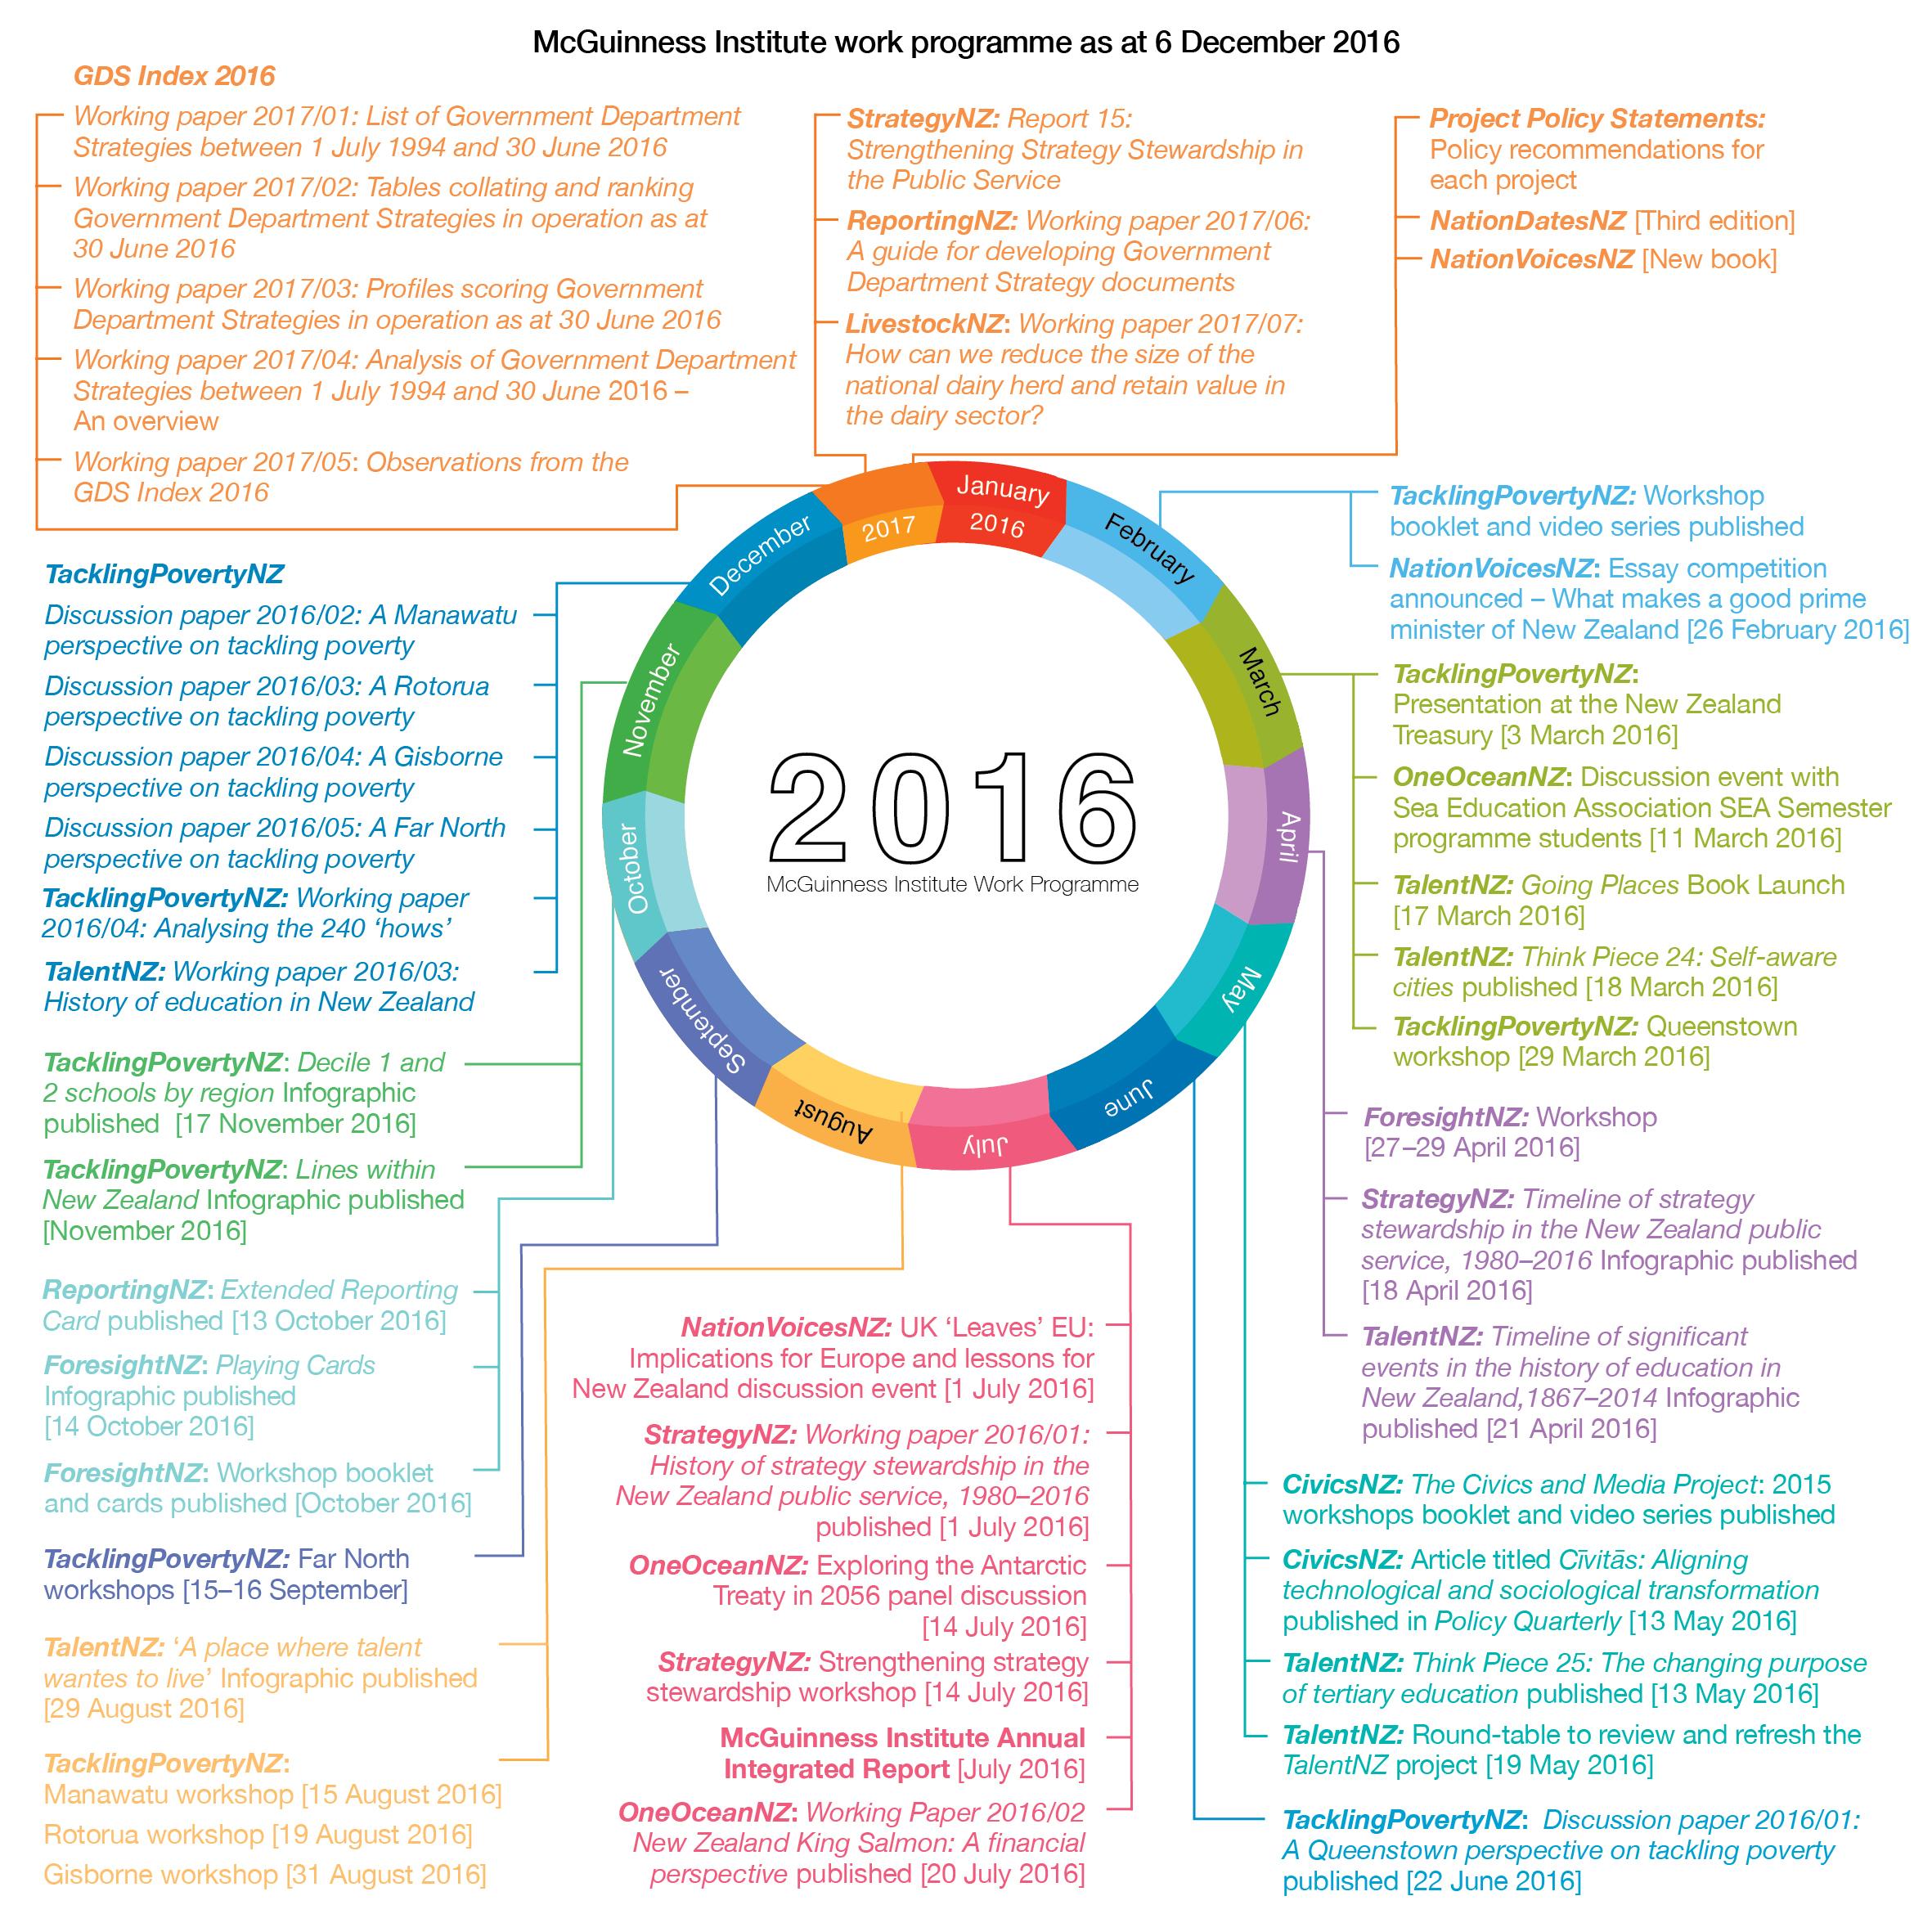 20161206-work-programme-2016-3-pm